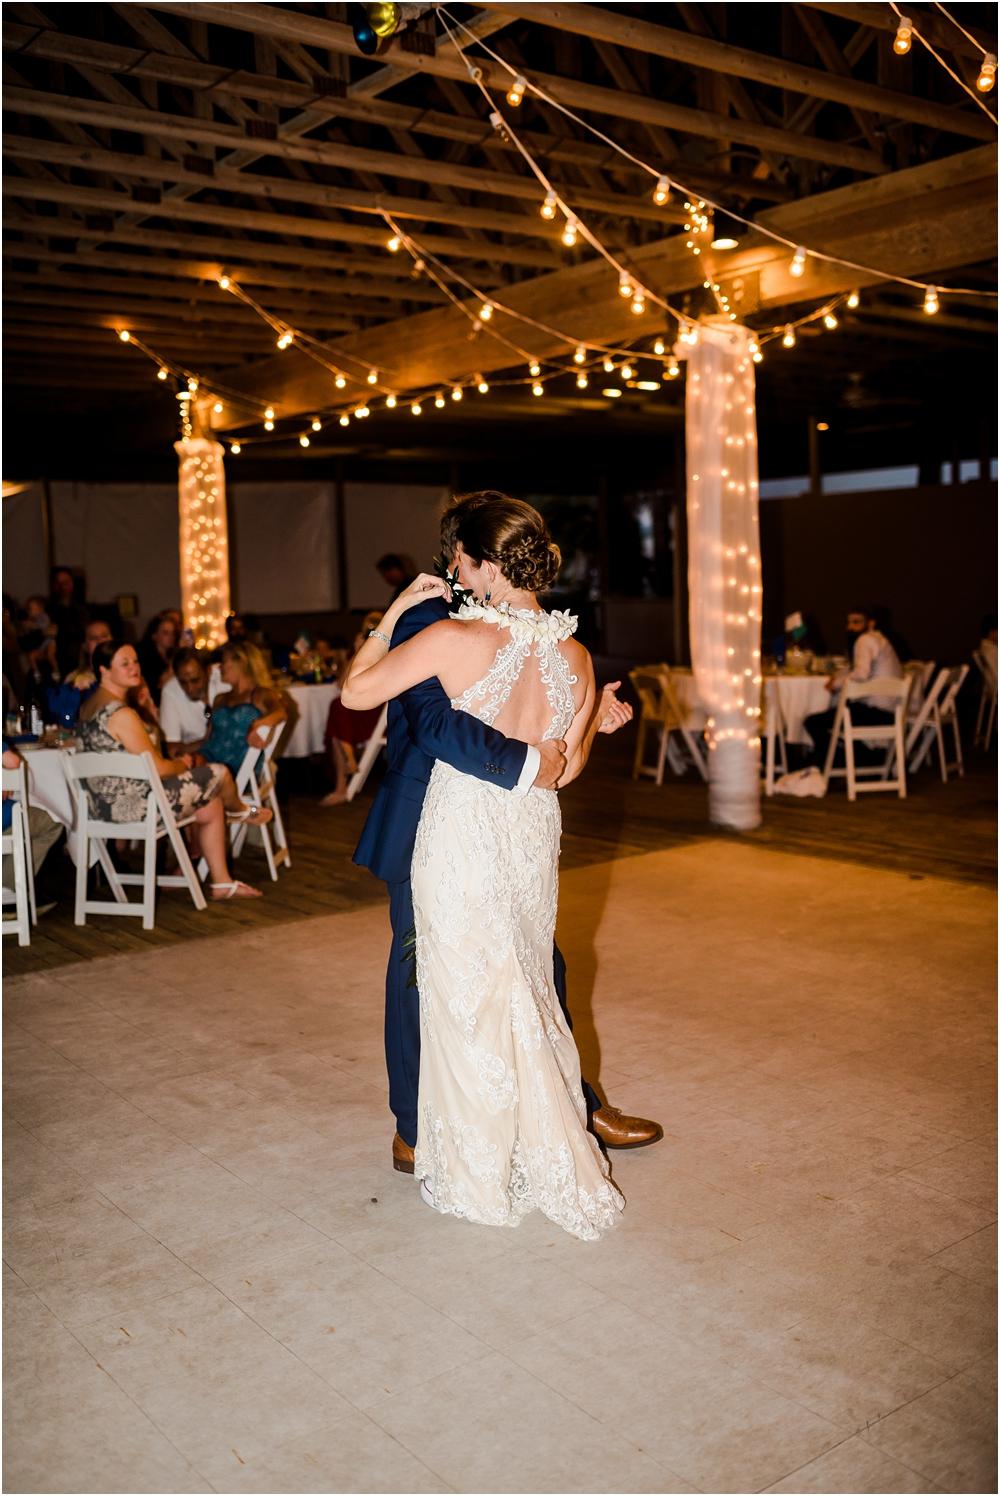 ledman-wedding-kiersten-stevenson-photography-30a-panama-city-beach-dothan-tallahassee-(545-of-763).JPG